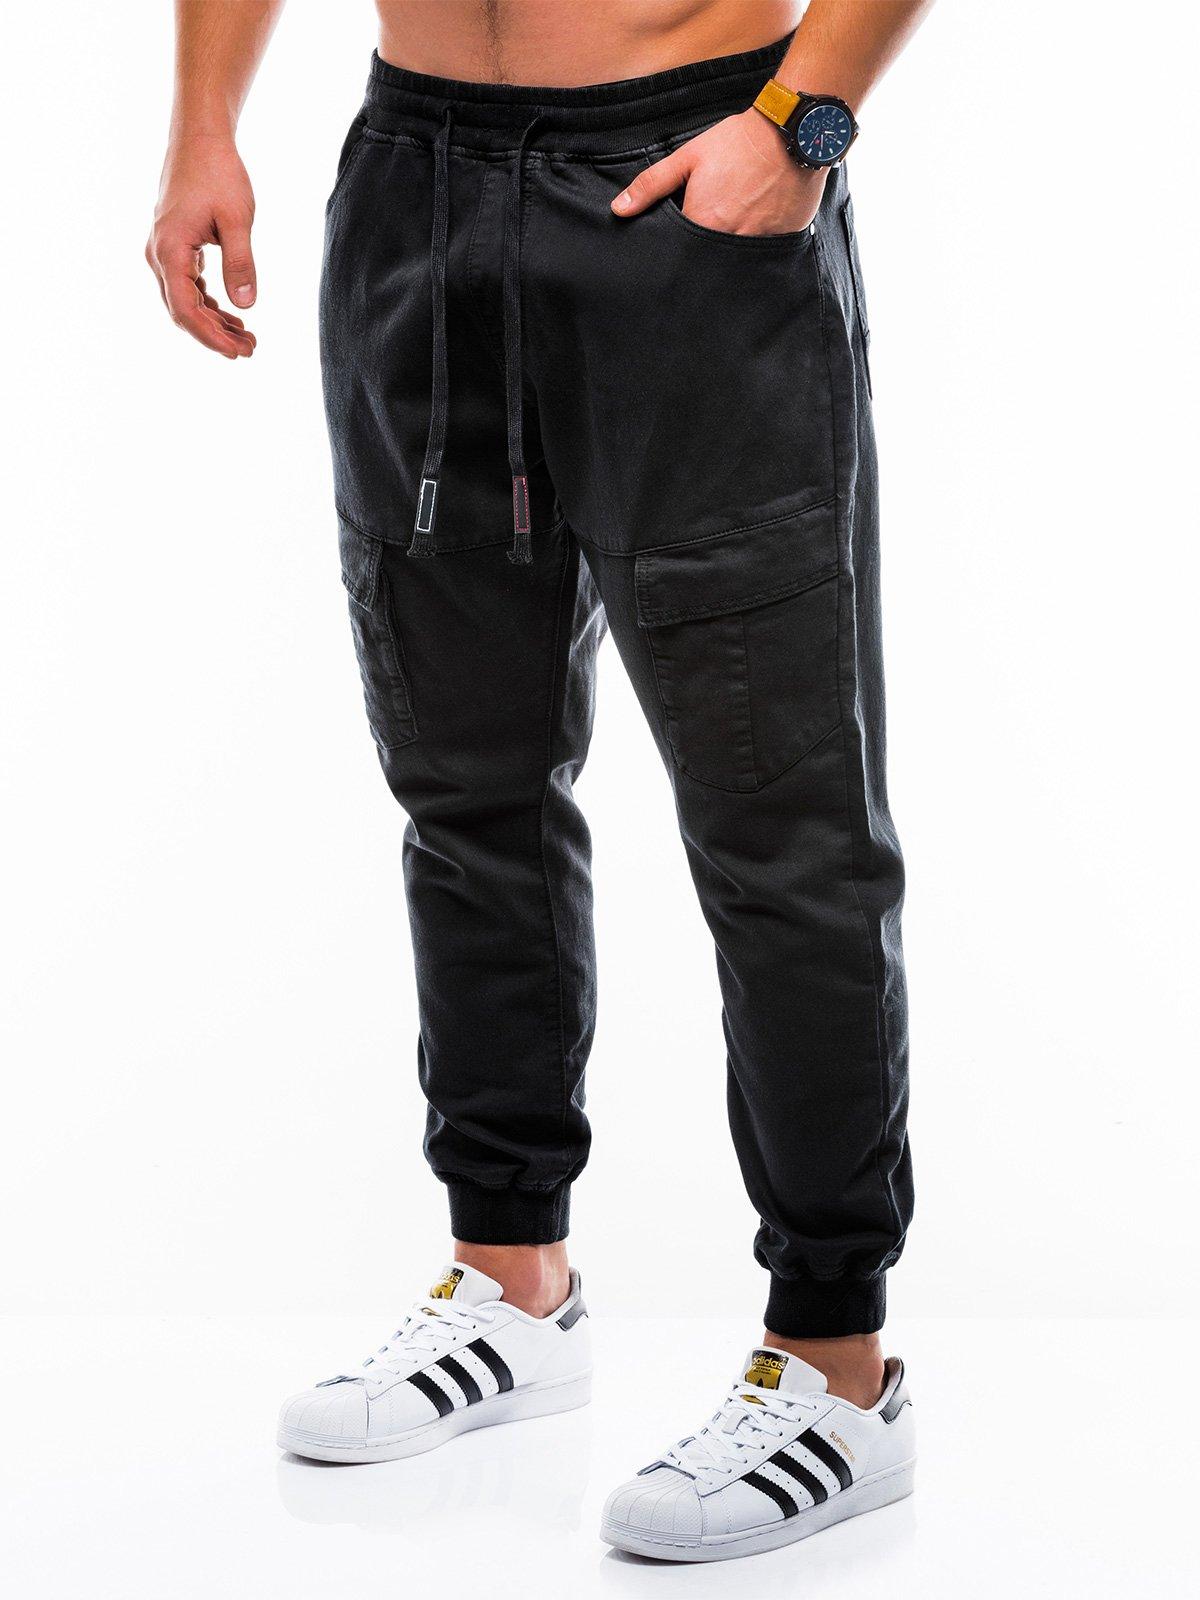 Spodnie męskie joggery 814P czarne